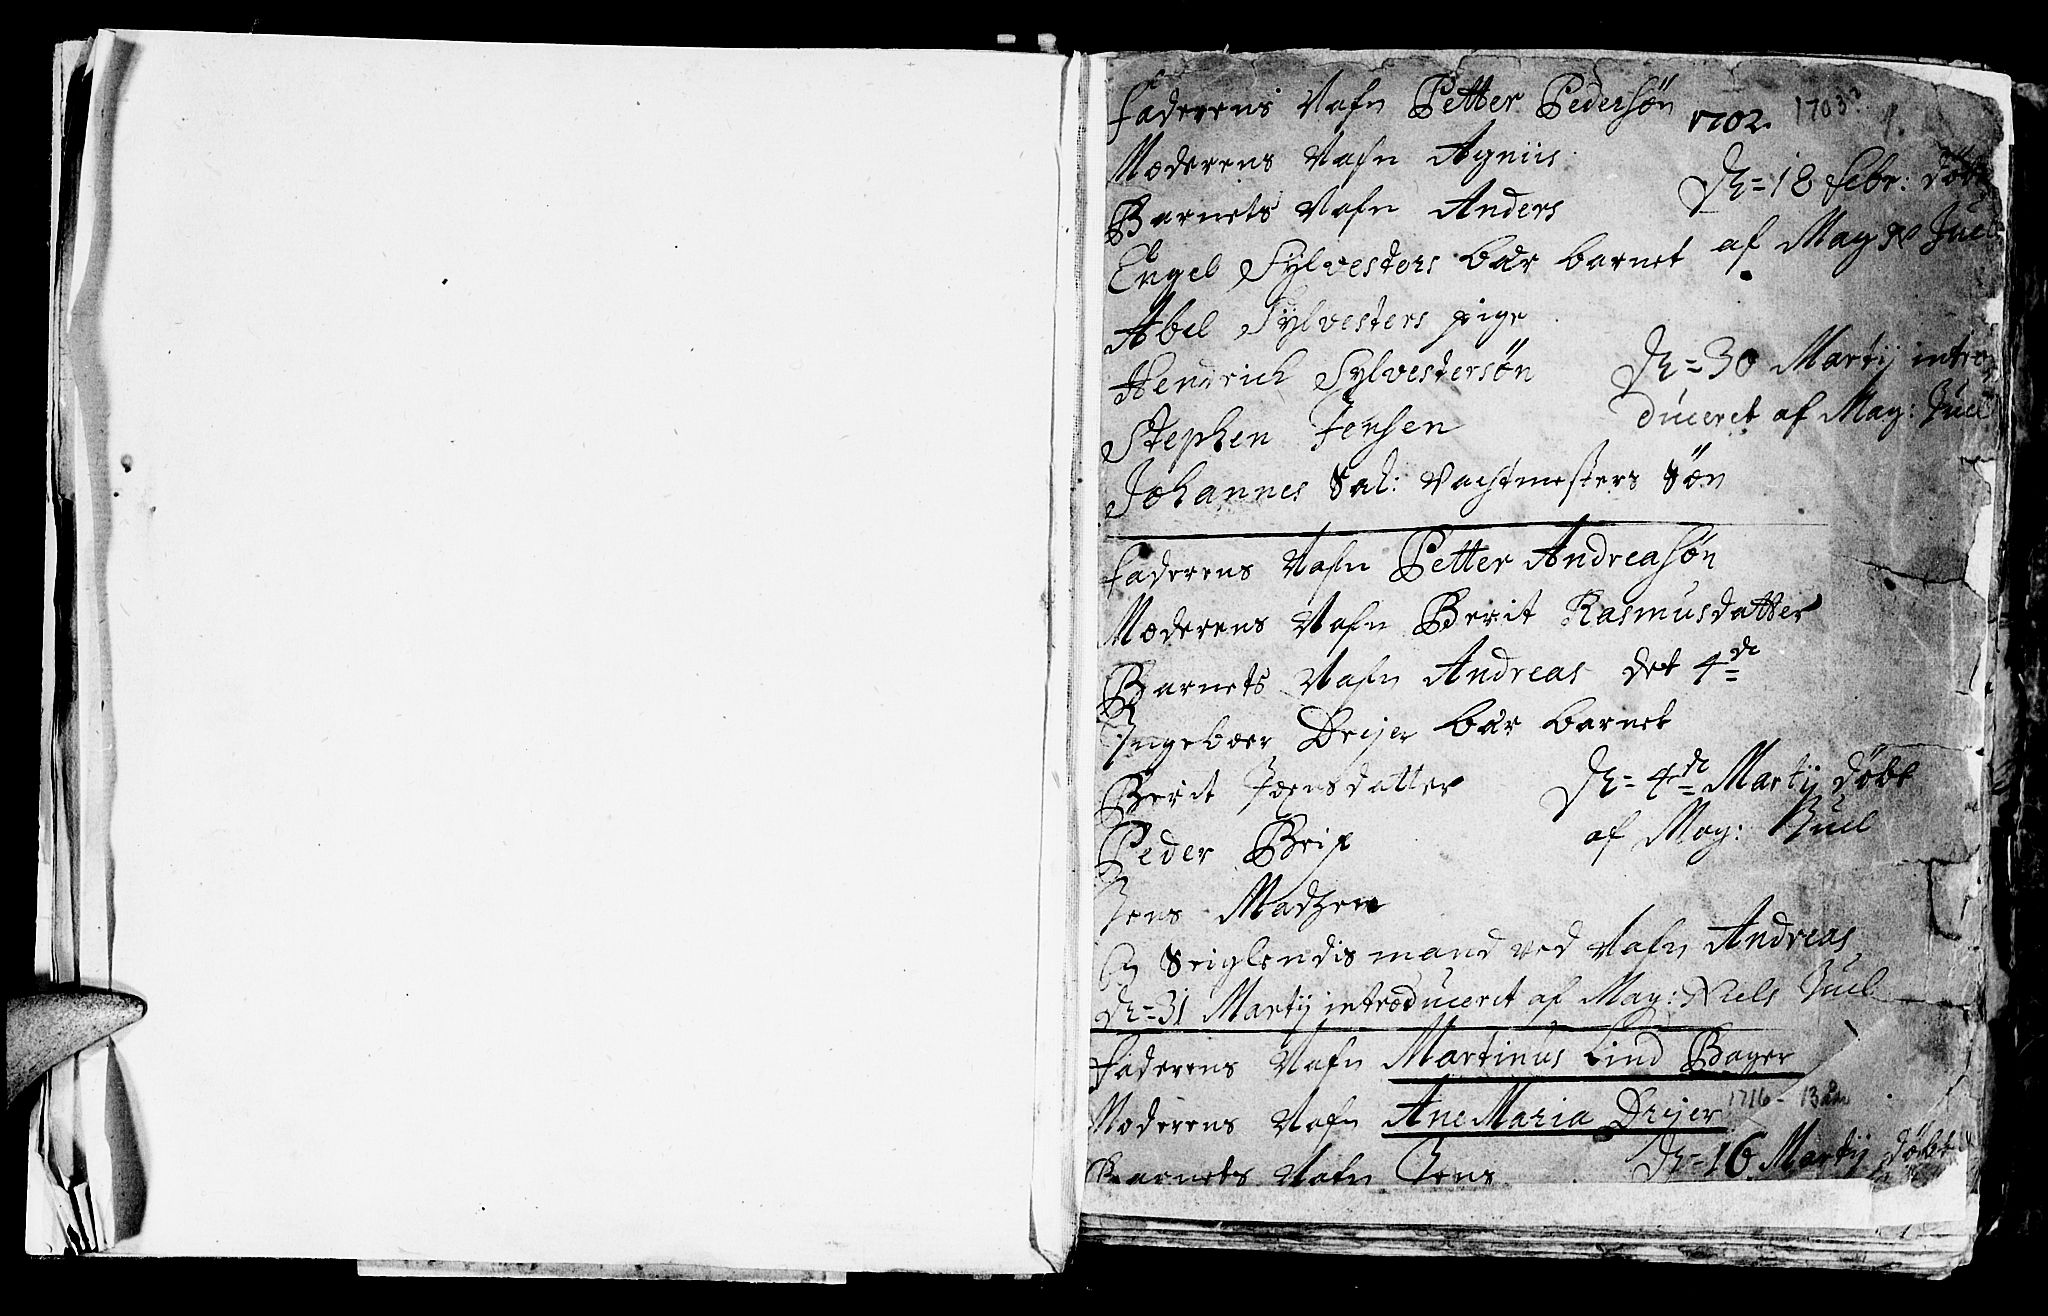 SAT, Ministerialprotokoller, klokkerbøker og fødselsregistre - Sør-Trøndelag, 601/L0034: Parish register (official) no. 601A02, 1702-1714, p. 1